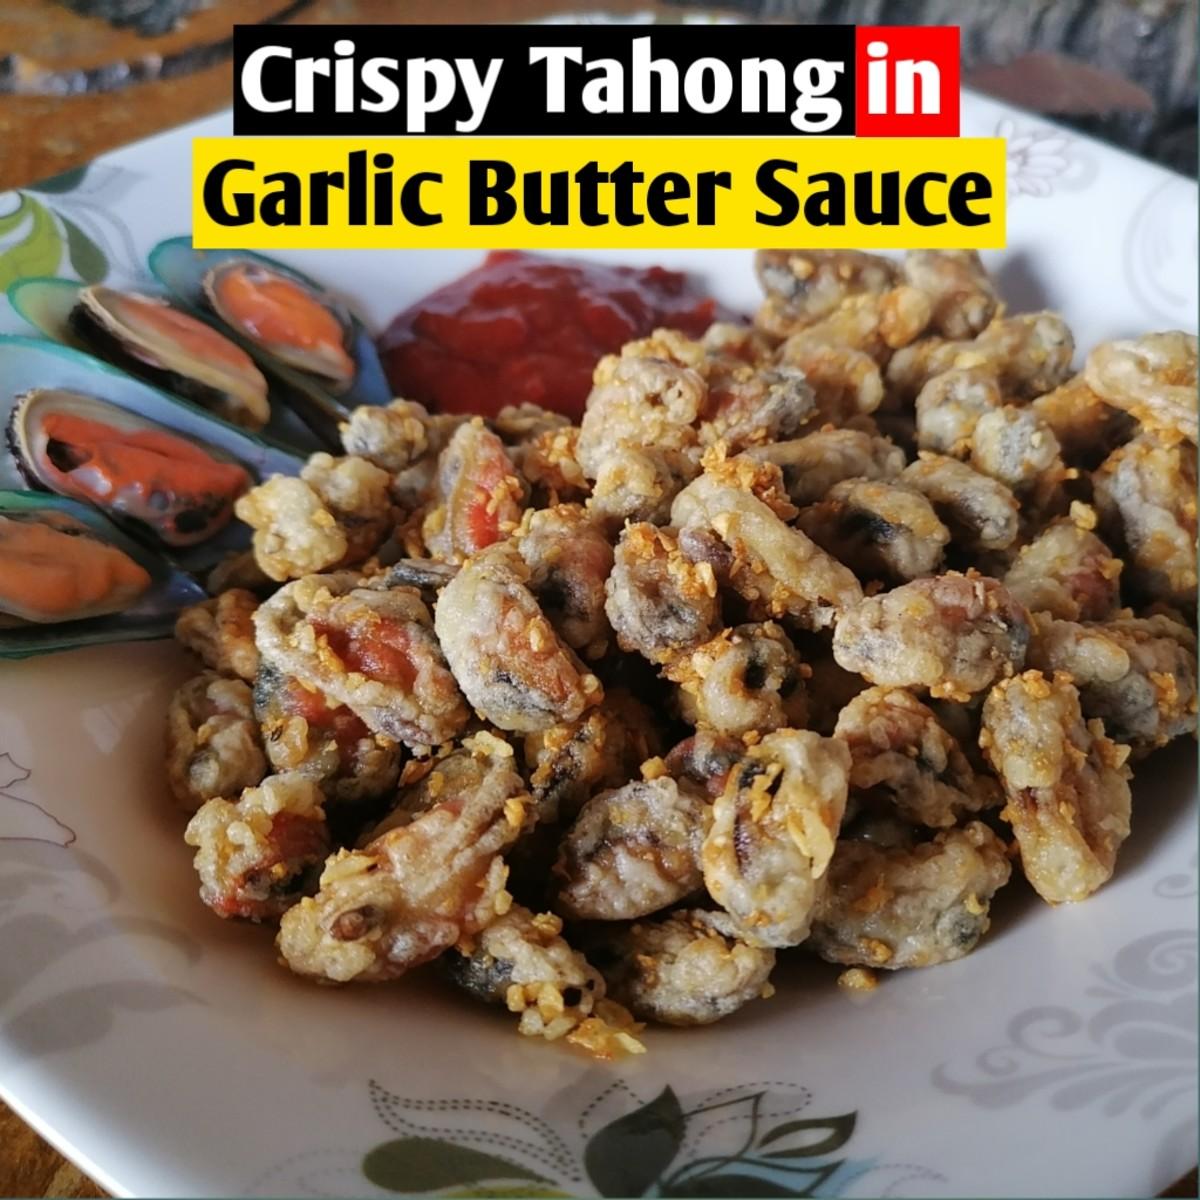 Crispy tahong (mussels) in garlic butter sauce